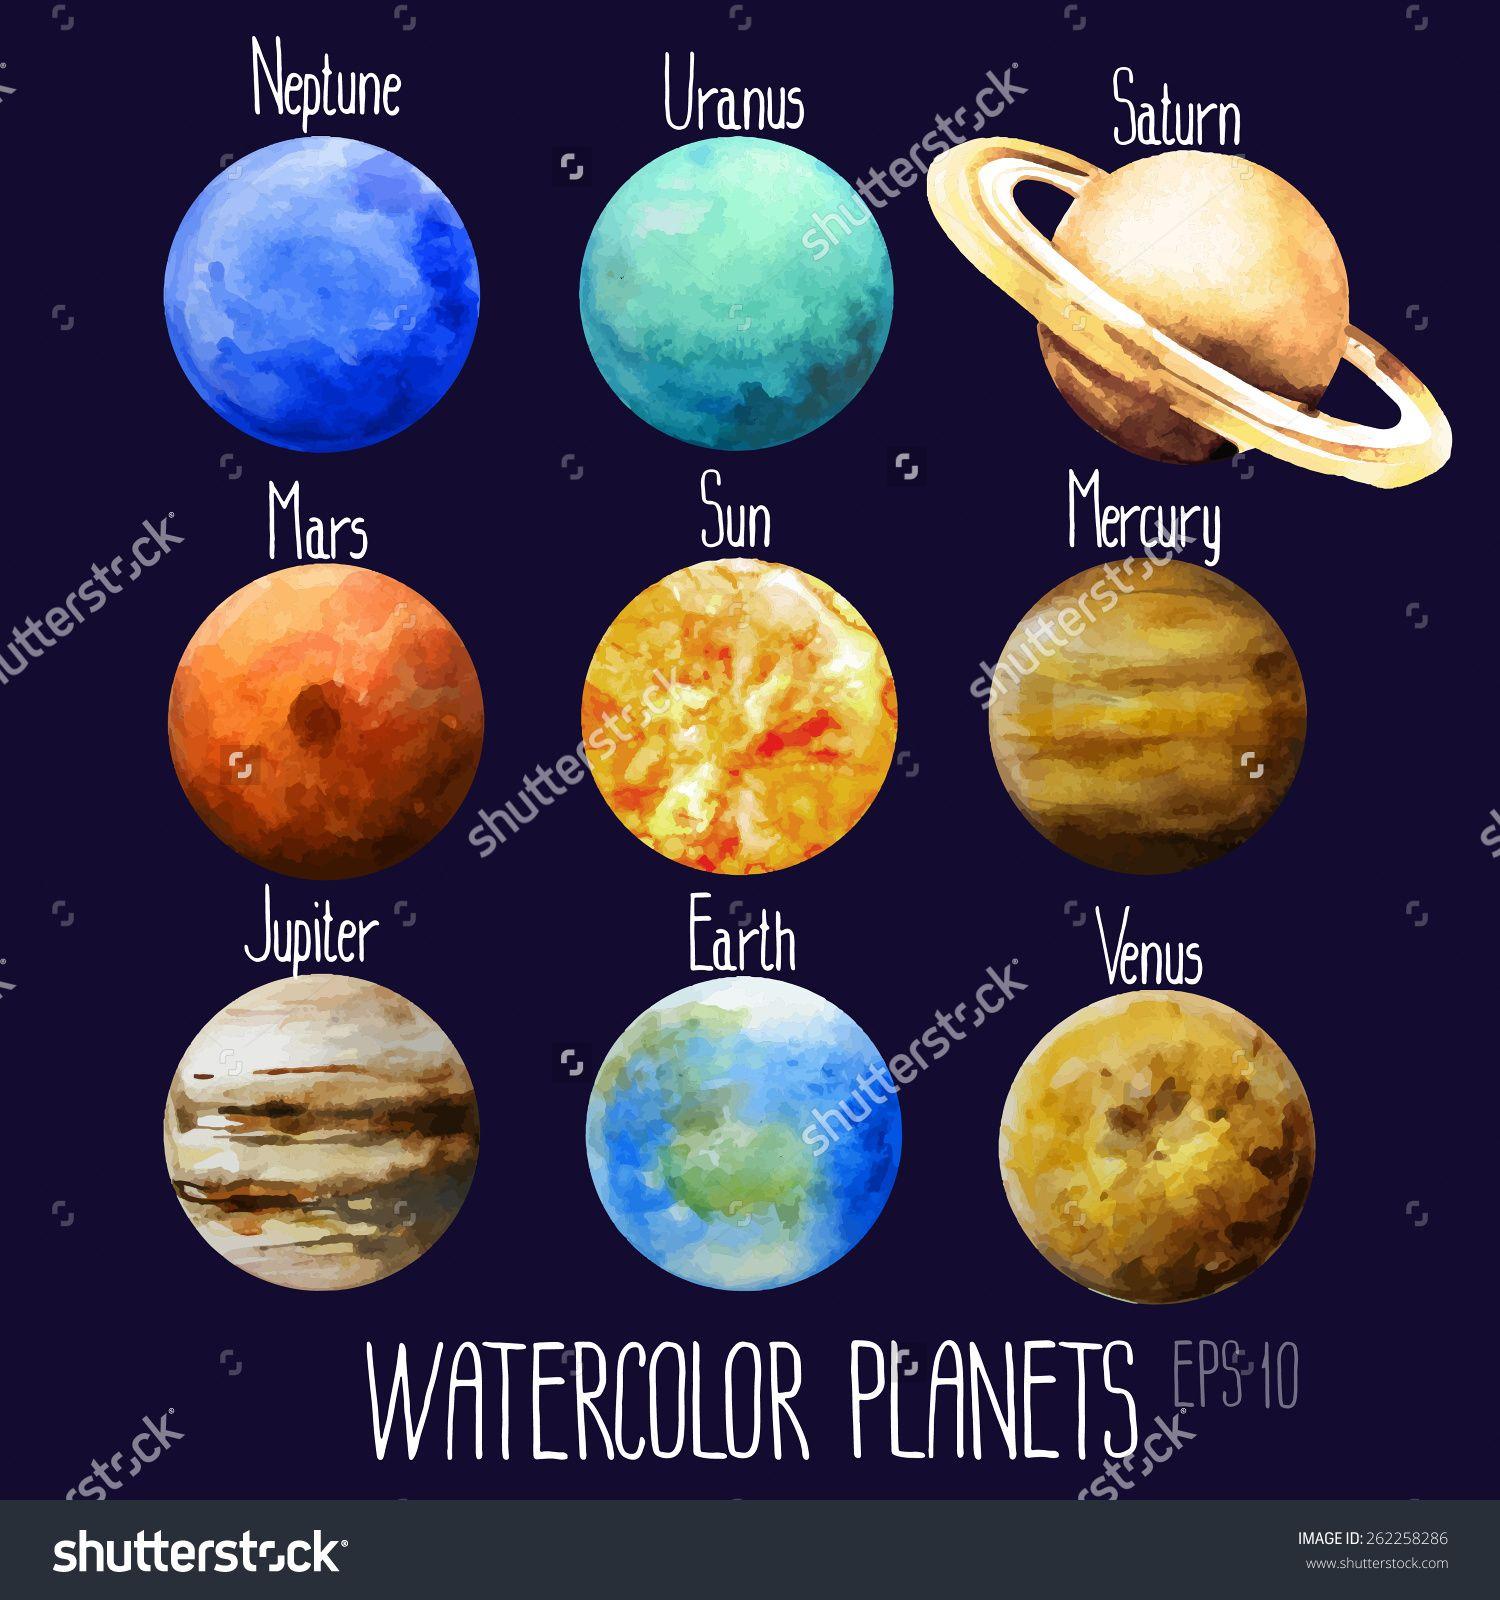 Stock Vector Watercolor Planets Sun Mercury Venus Earth Mars Jupiter Saturn Uranus Neptune Vector 262258286 Jpg 1500 16 Planet Painting Planet Drawing Planets